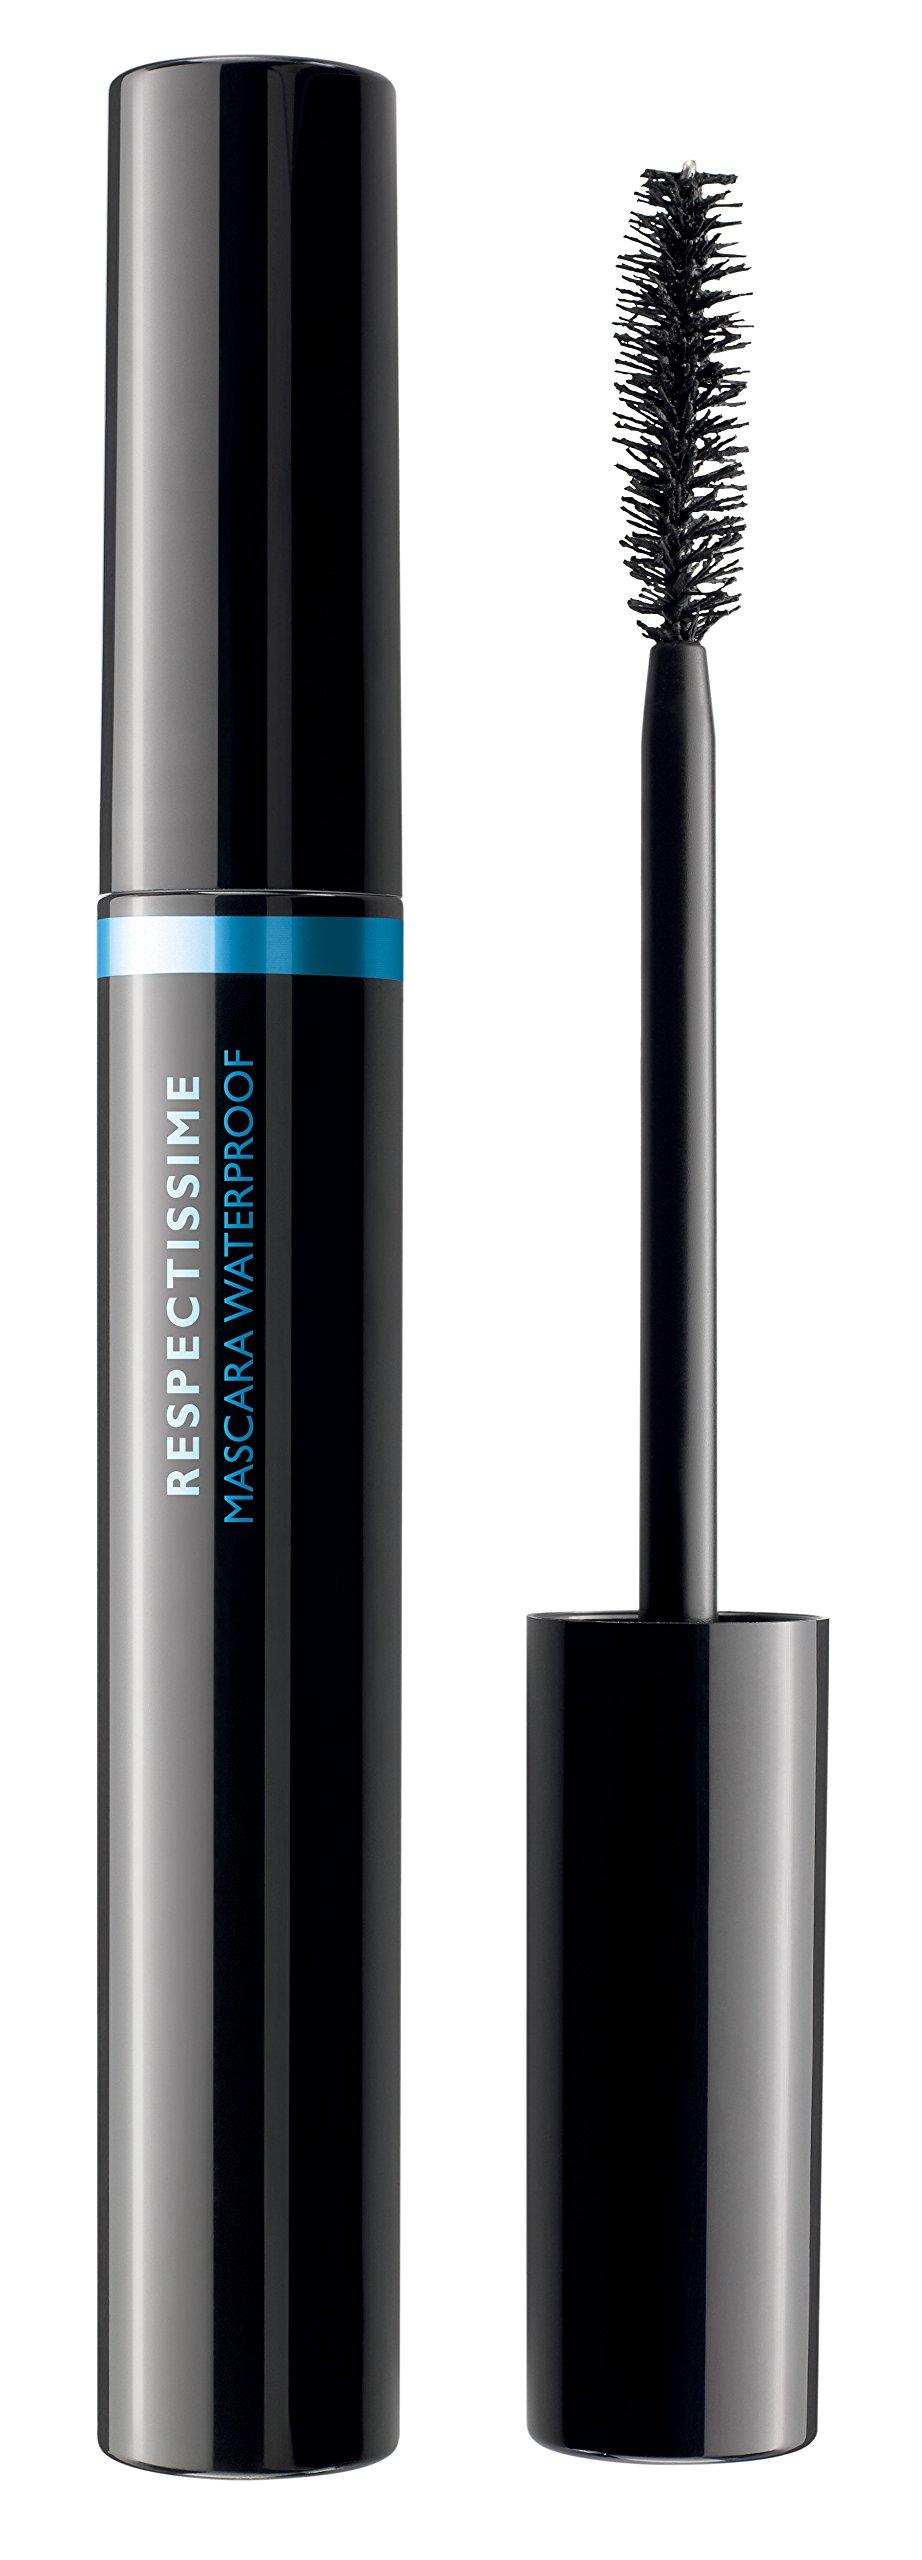 La Roche-Posay Respectissime Waterproof Mascara, 0.25 Fl. Oz.